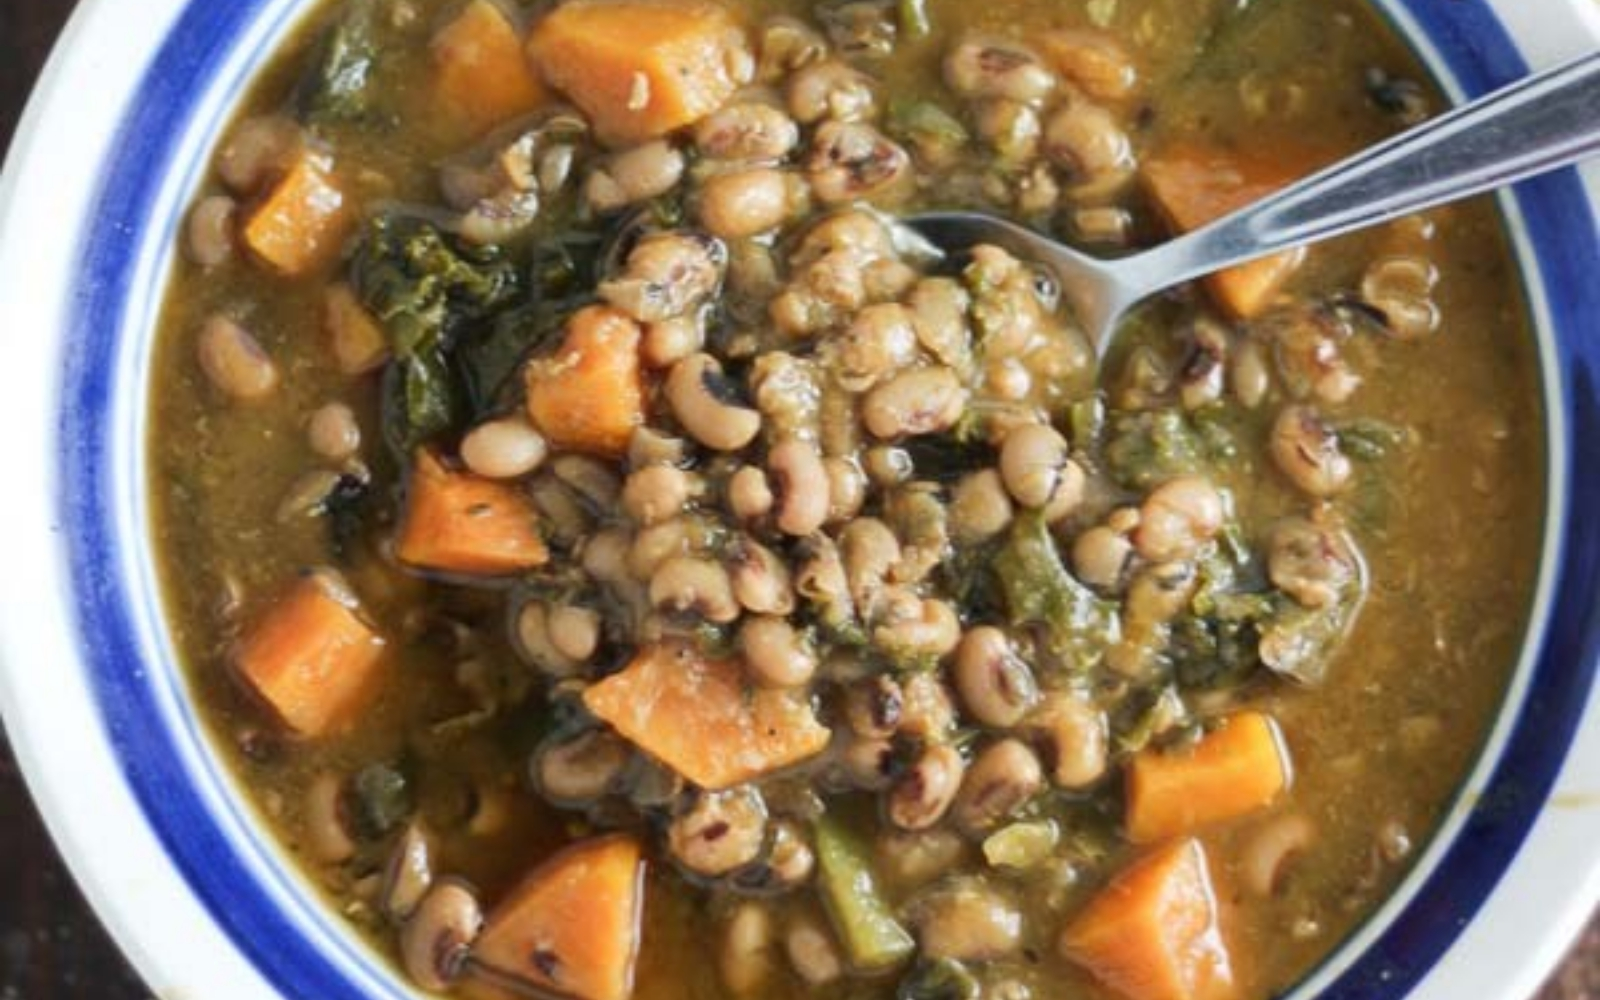 Slow Cooker Sweet Potato Kale Black Eyed Pea Soup [Vegan, Gluten-Free, Soy-Free]